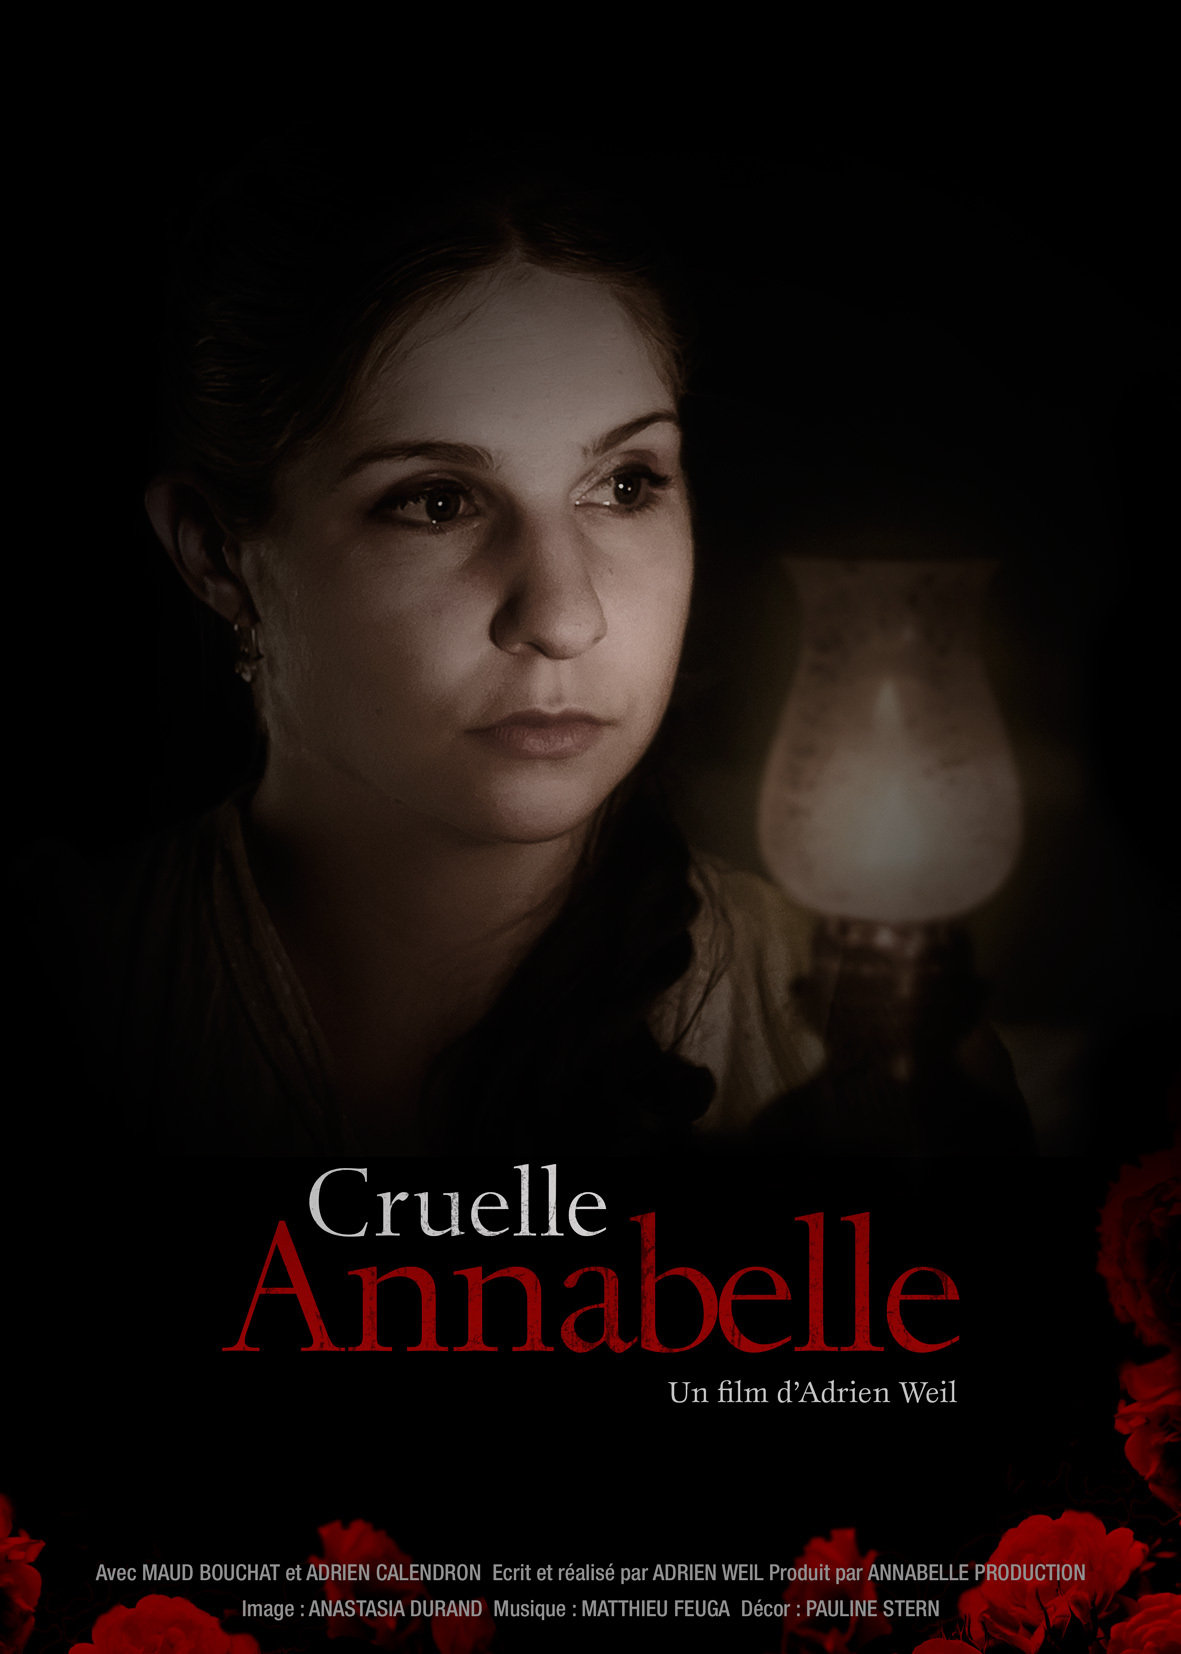 Cruelle Annabelle 2014 Imdb